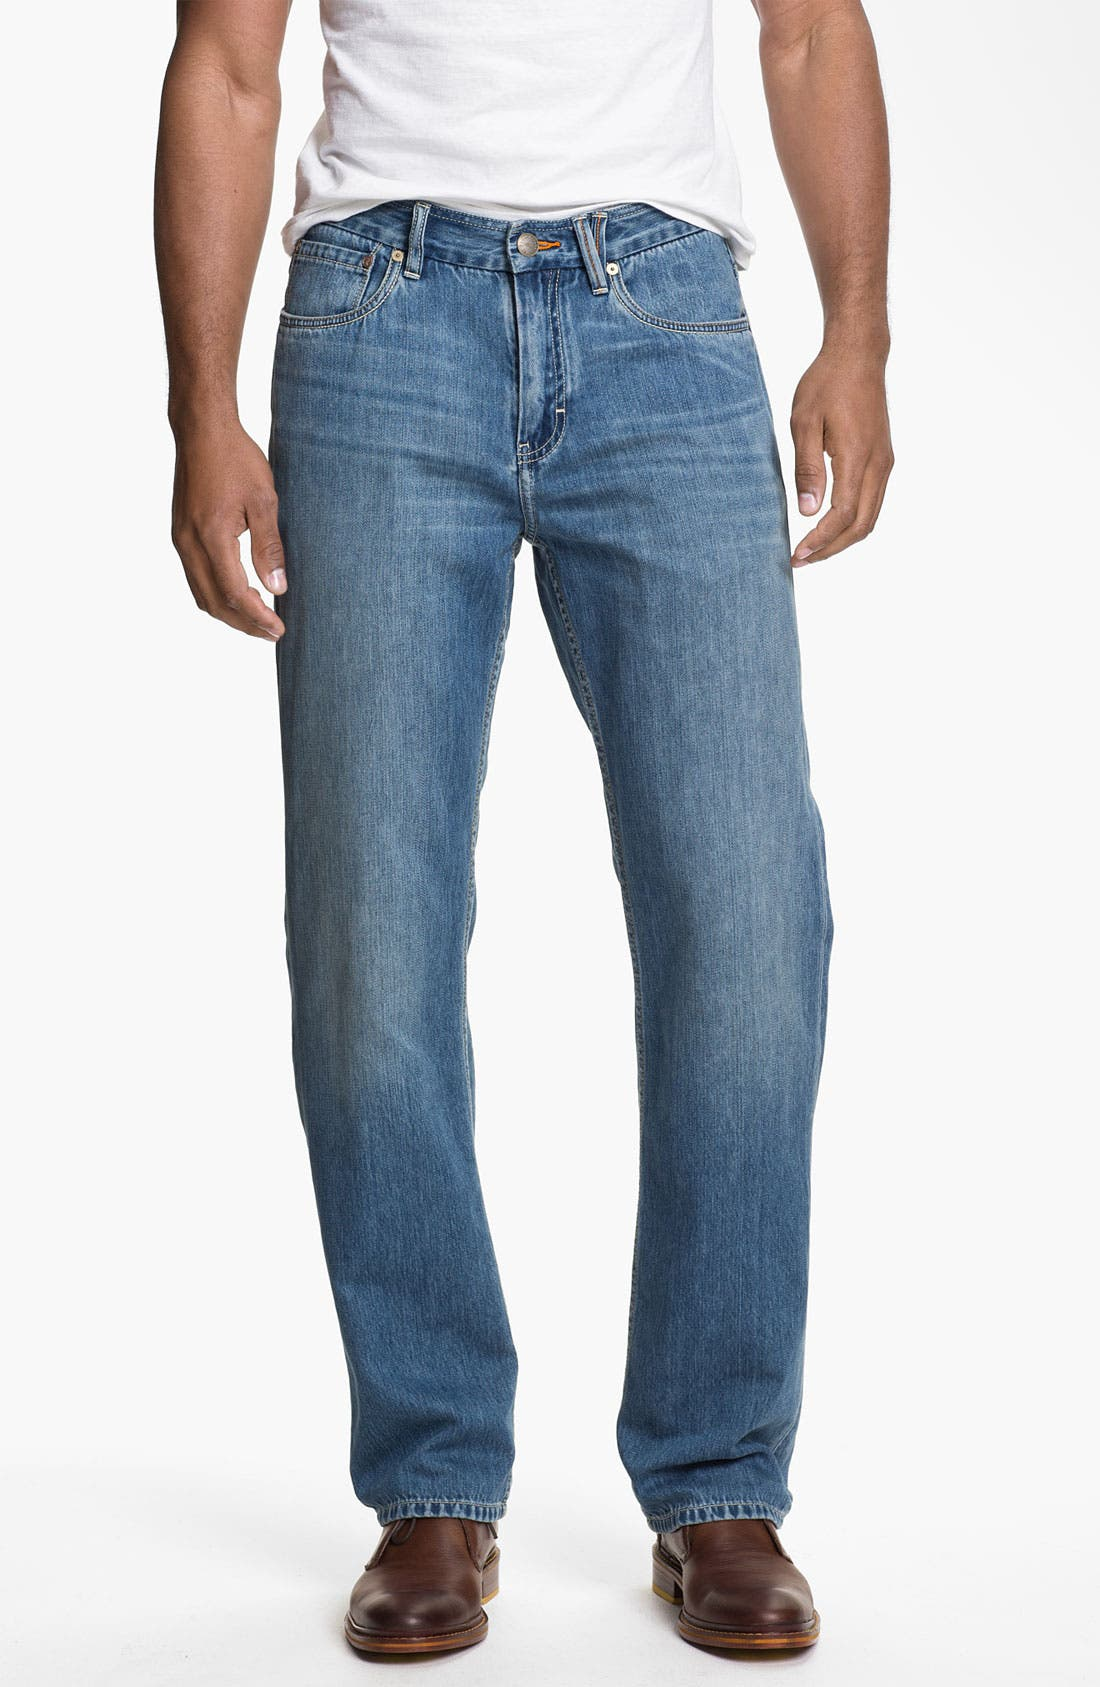 Alternate Image 1 Selected - Tommy Bahama Denim 'Coastal Island Ease' Straight Leg Jeans (Light)